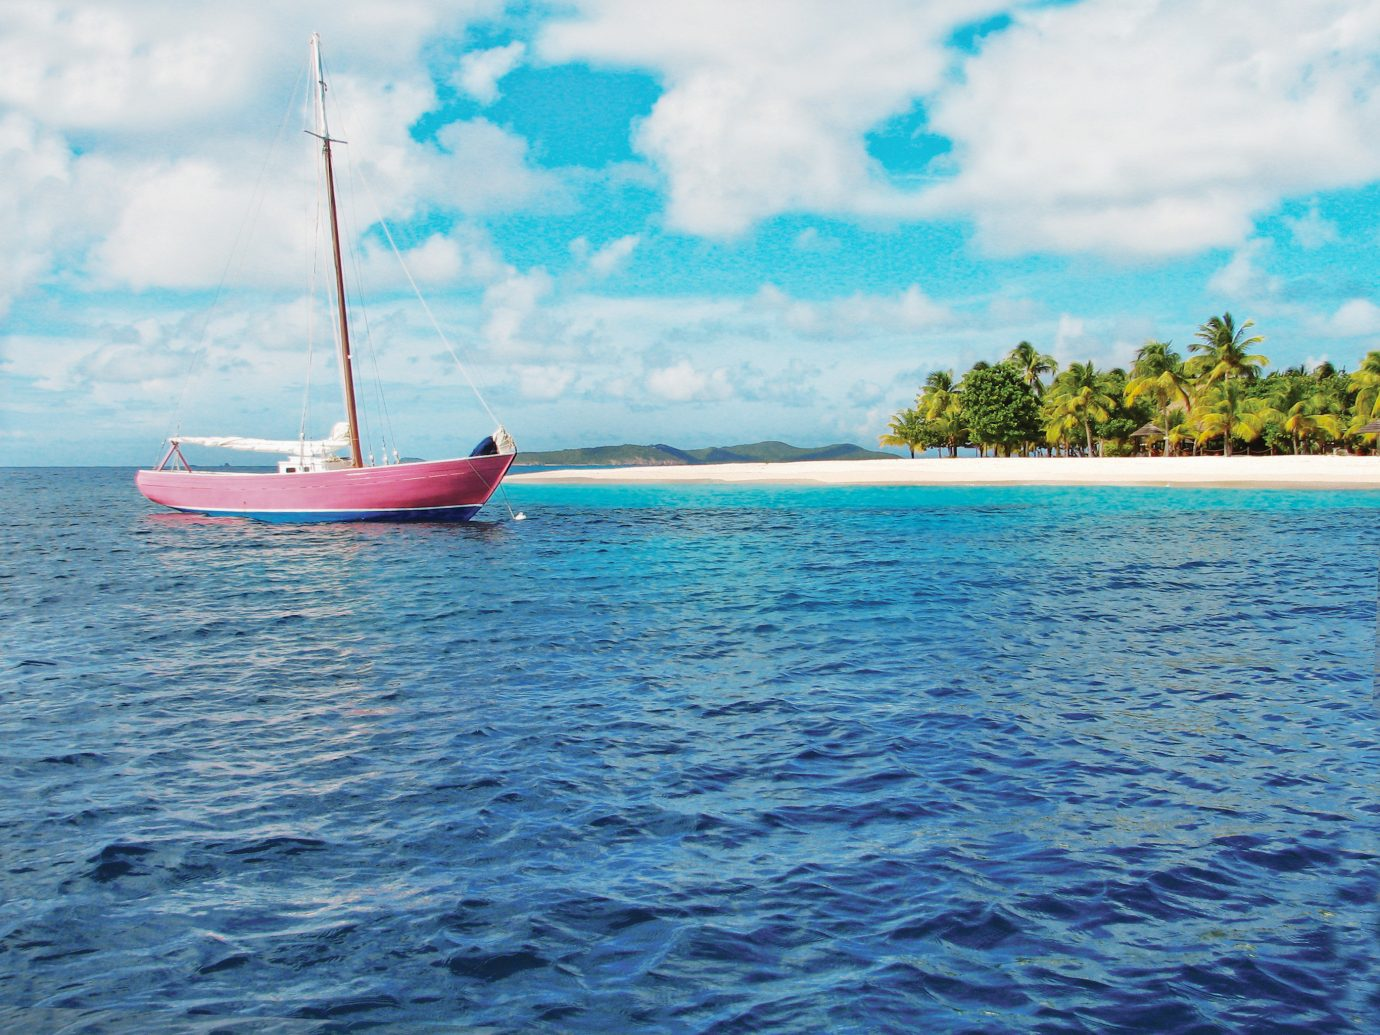 Hotels water outdoor sky Boat watercraft vehicle sailboat Sea sailing transport Ocean caribbean bay boating Lagoon sailing vessel sail Island day